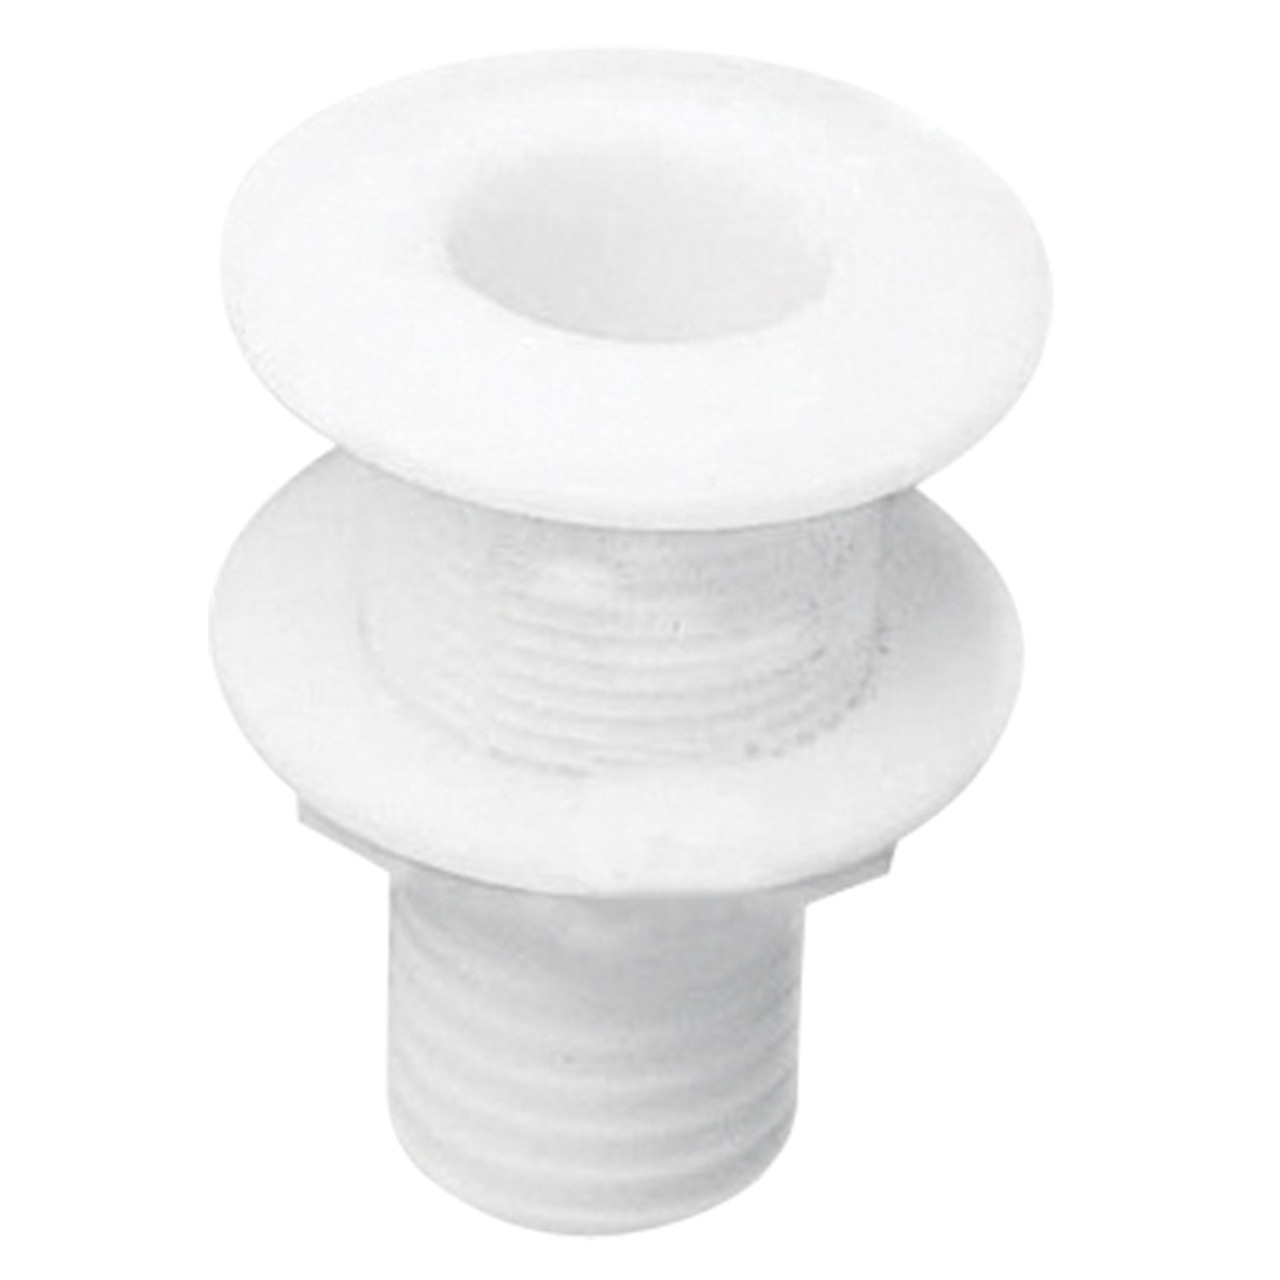 White Nylon Plastic Skin Fitting with Hosetail Sizes Available